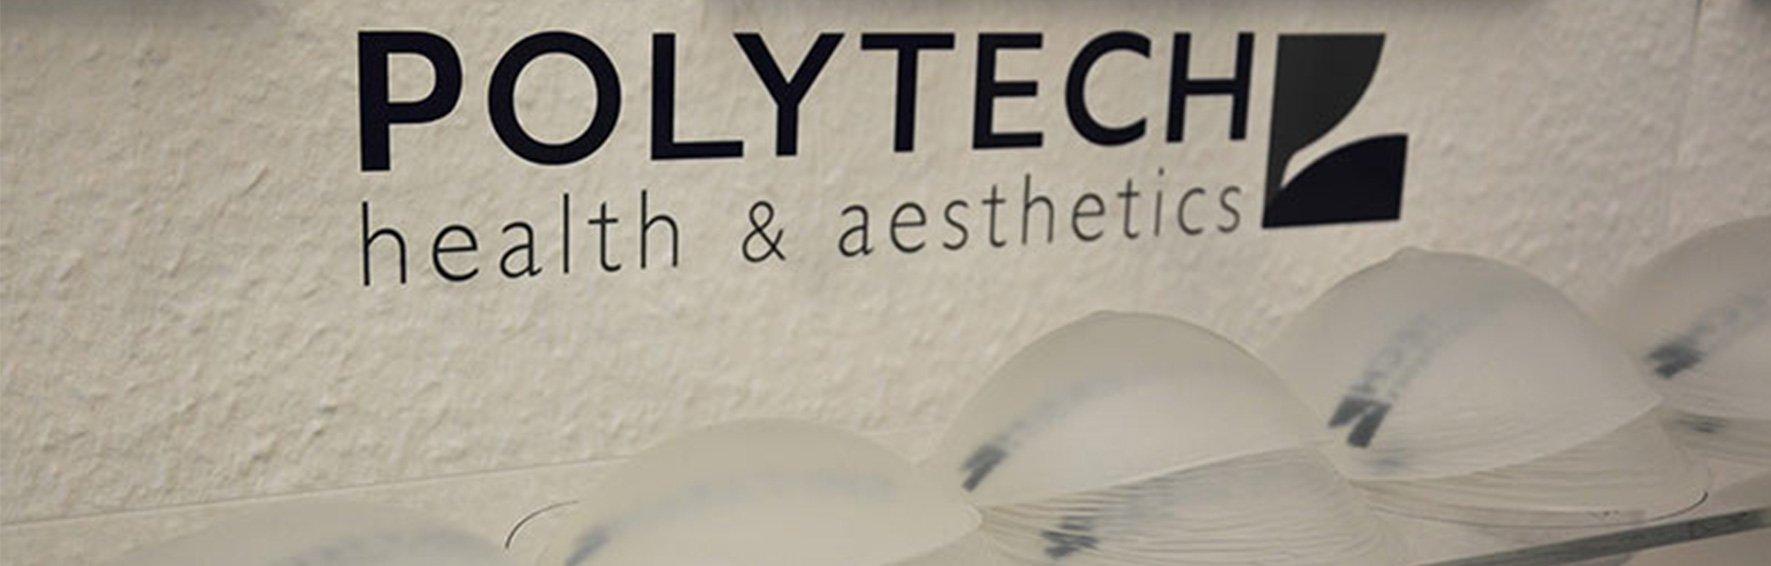 Alster-Klinik Hamburg Brustvergroesserung Polytech